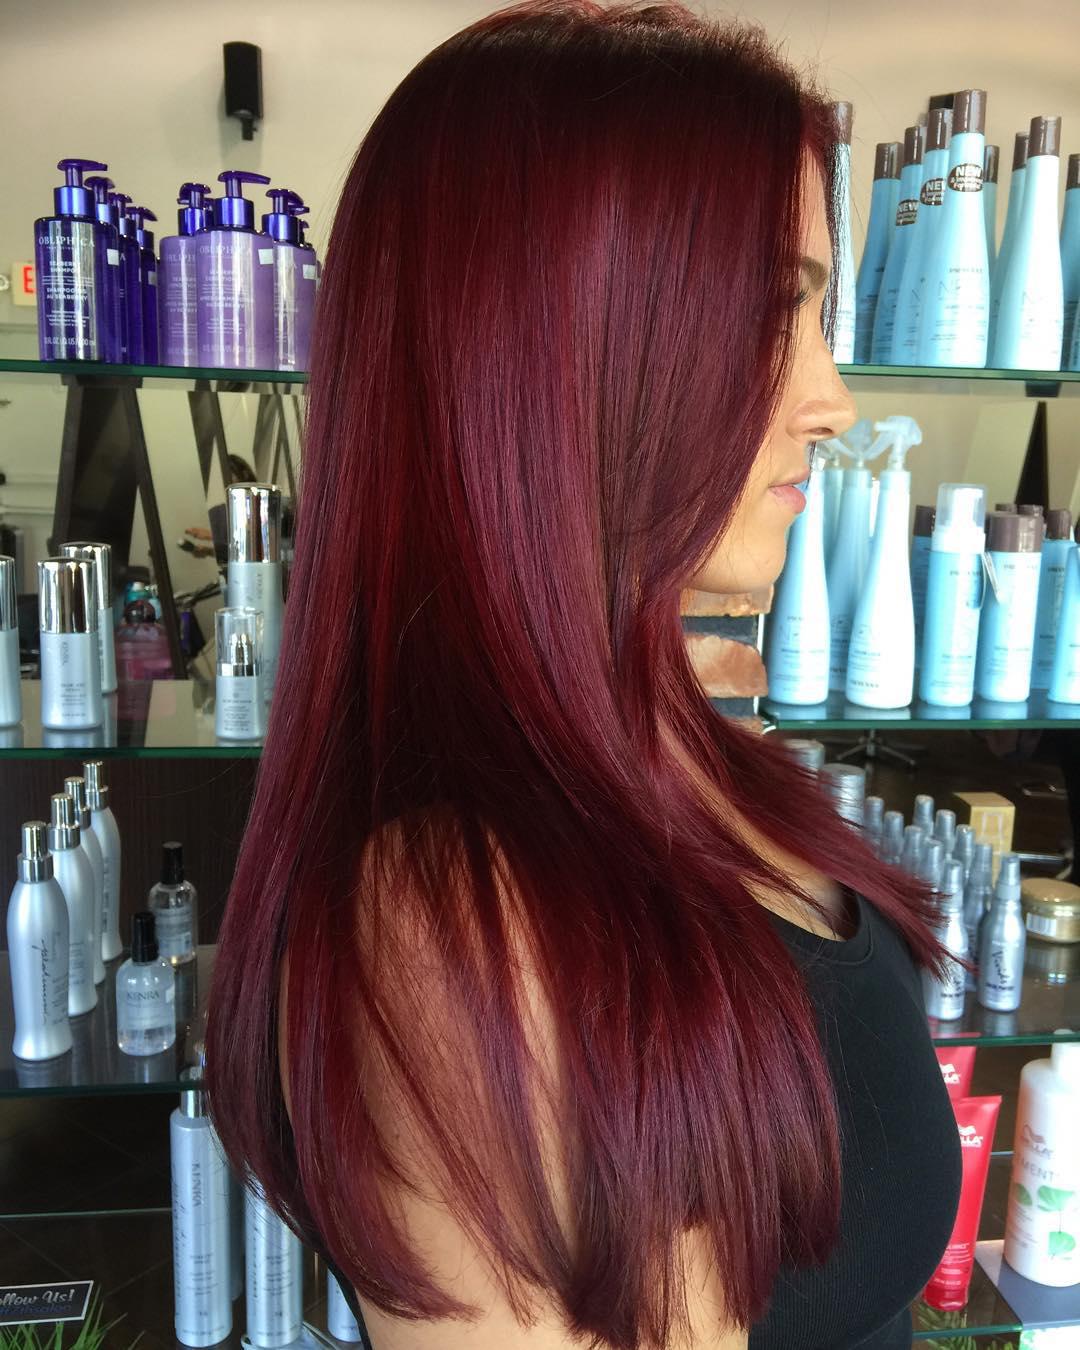 50 Shades of Burgundy Hair Color: Dark, Maroon, Burgundy ...